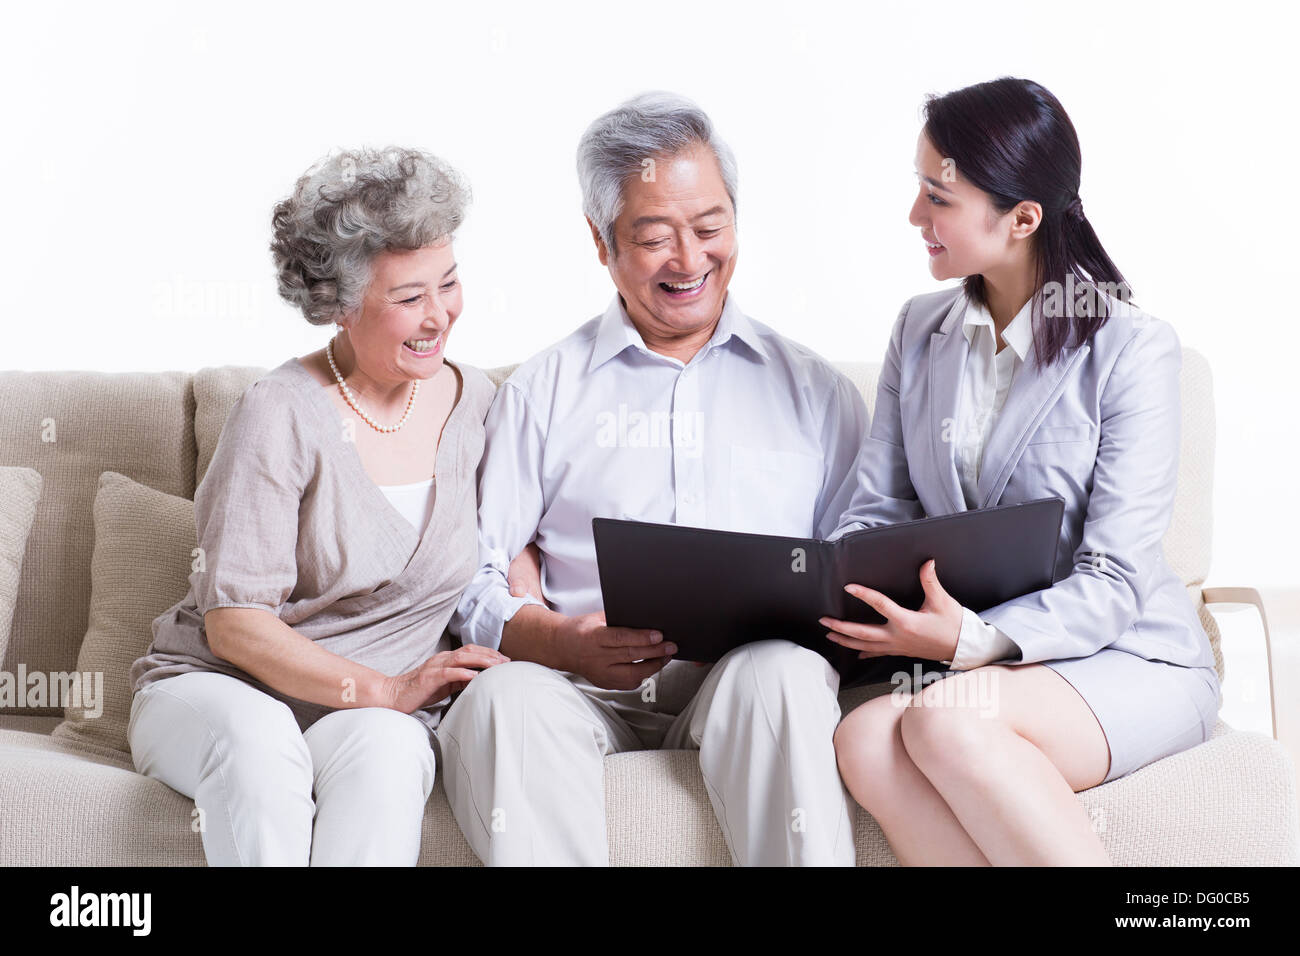 The United States Jewish Seniors Online Dating Service